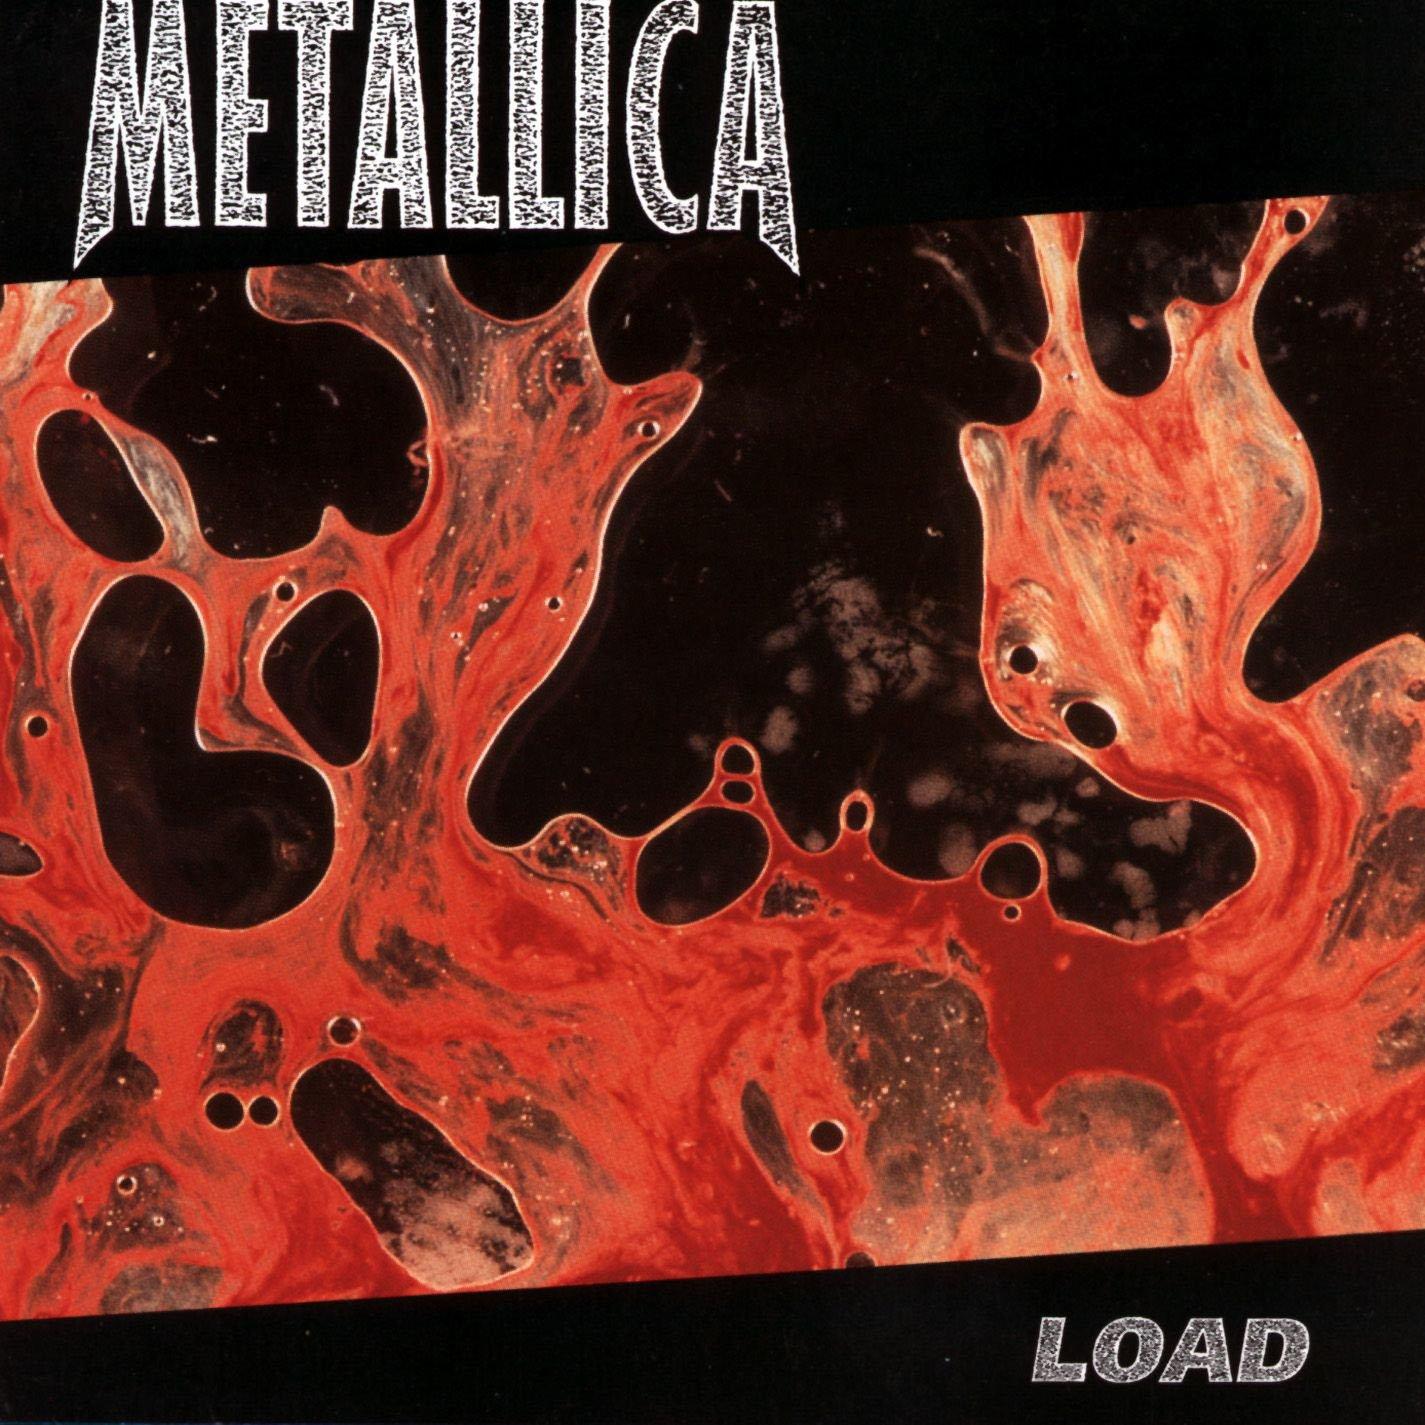 Amazon.com: Load: Music